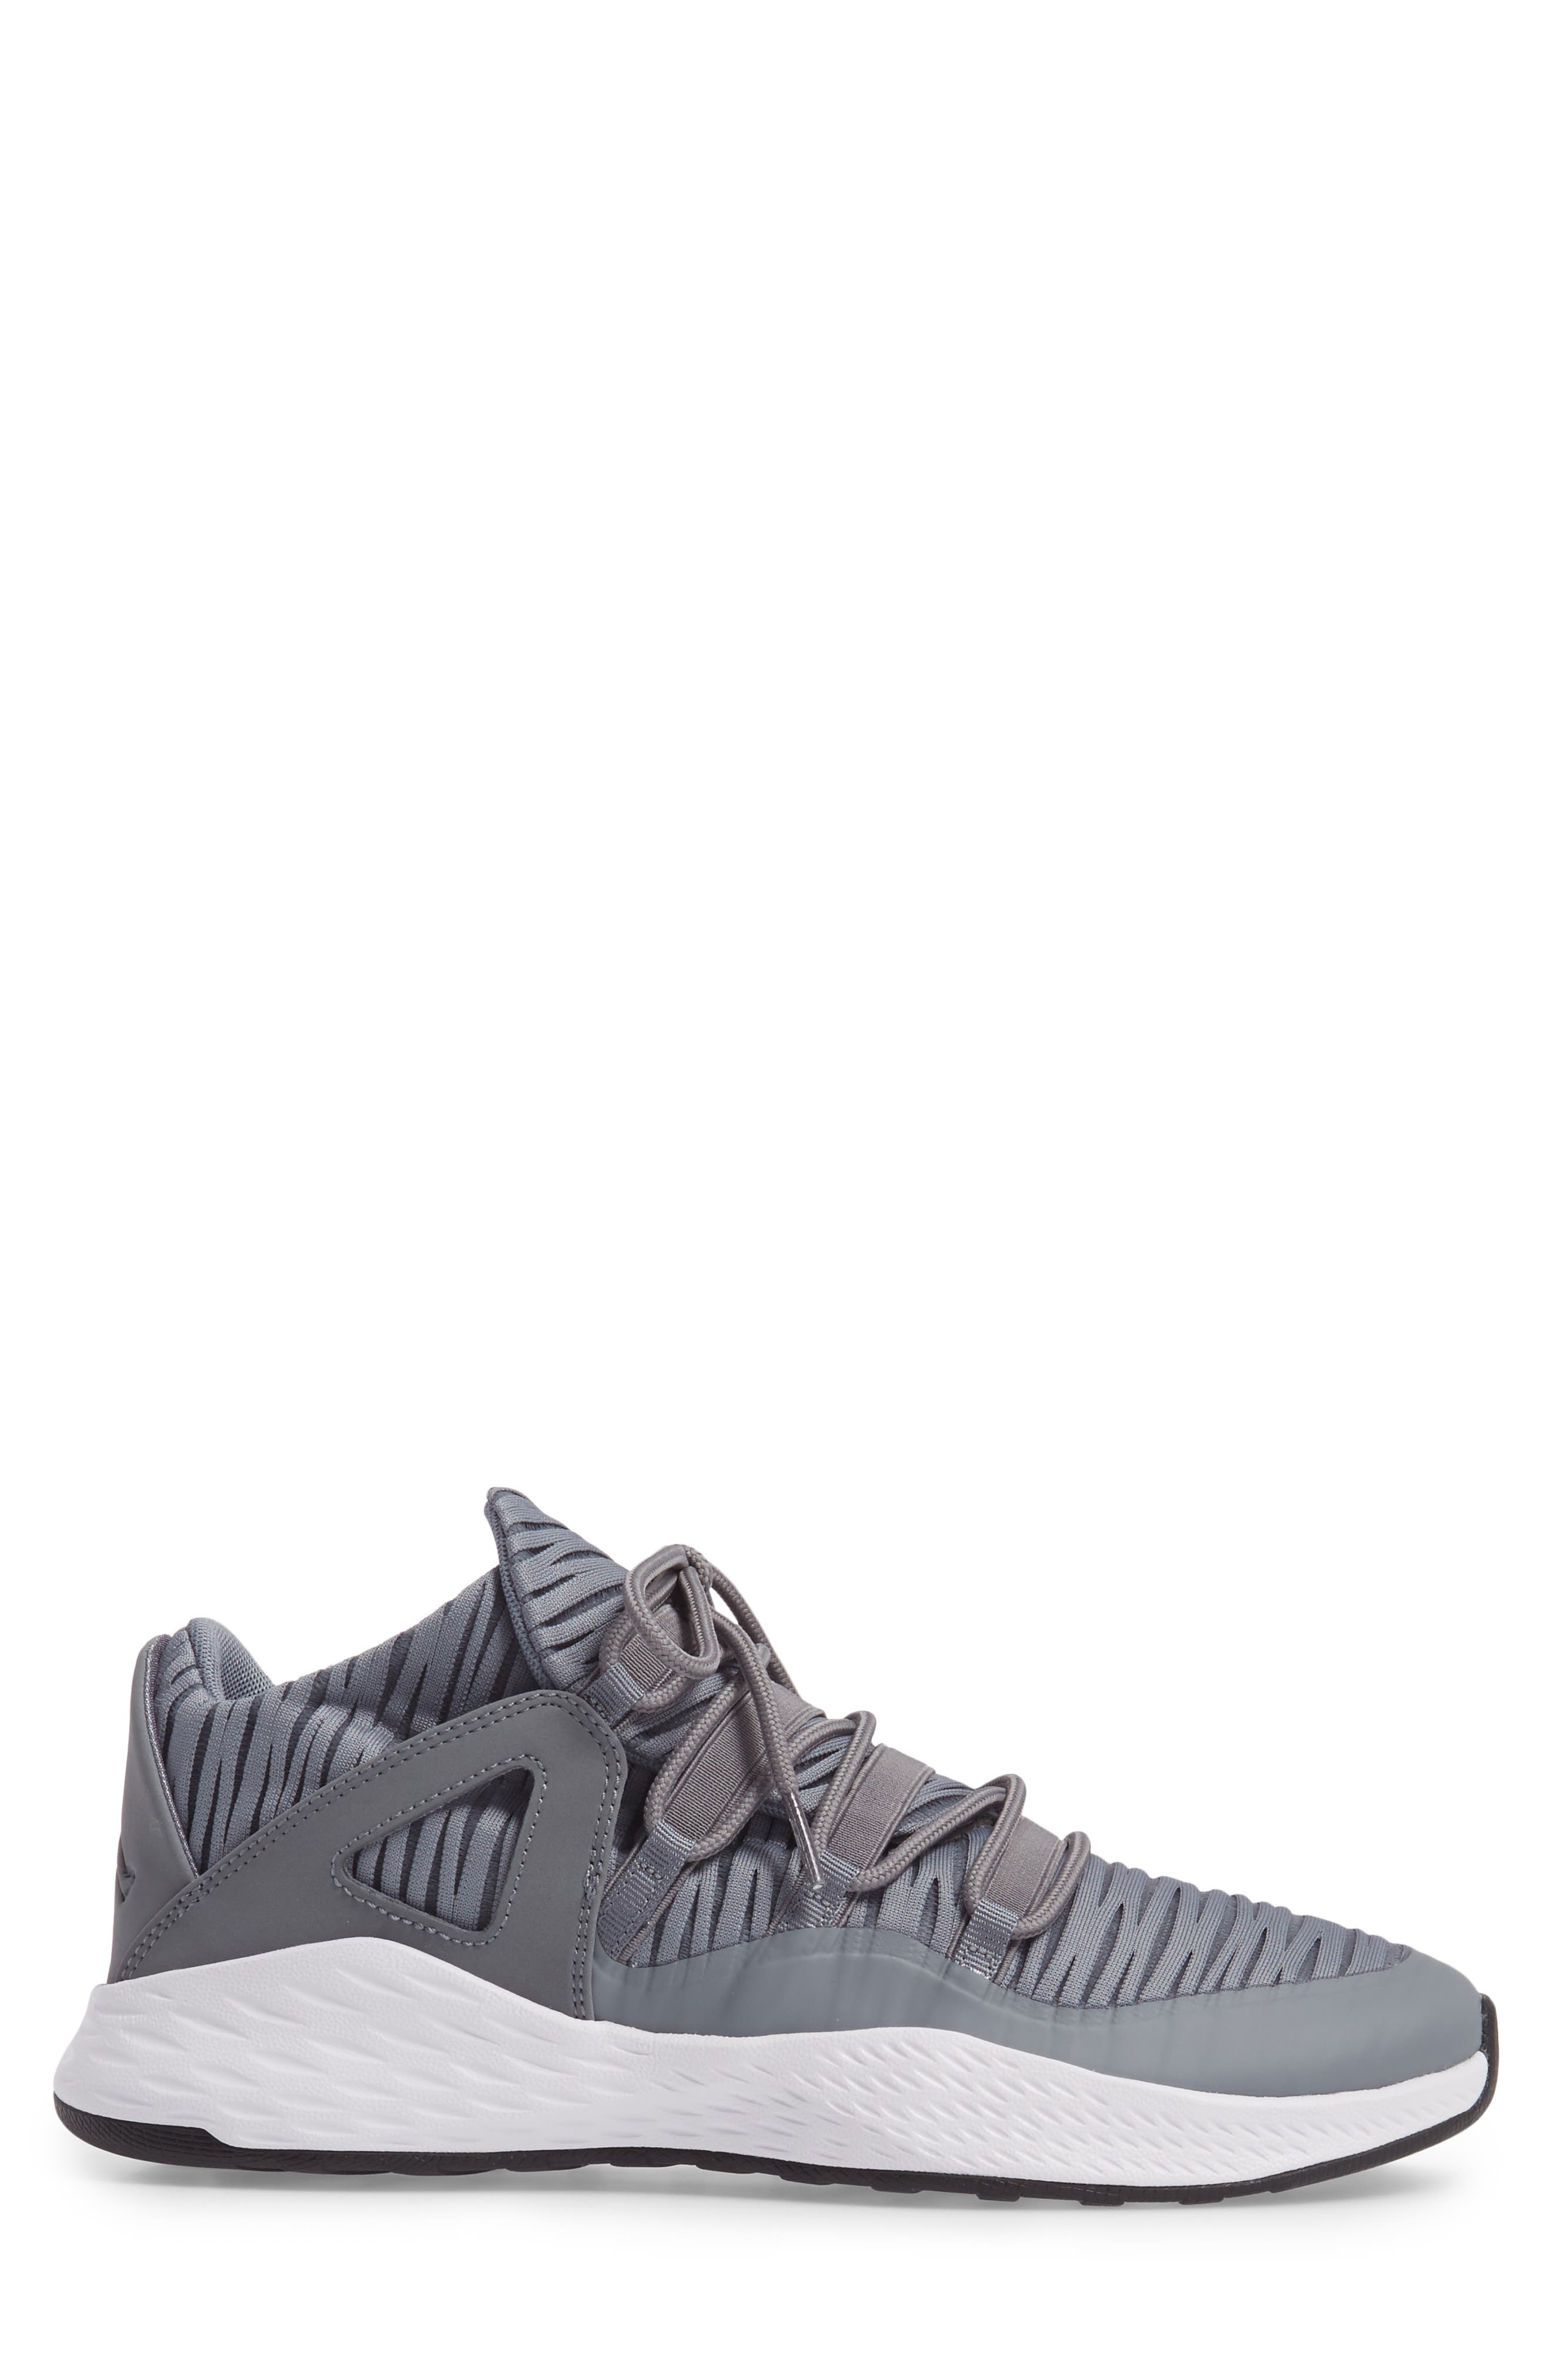 Jordan Formula 23 Low Sneaker,                             Alternate thumbnail 3, color,                             Cool Grey/ White/ Black